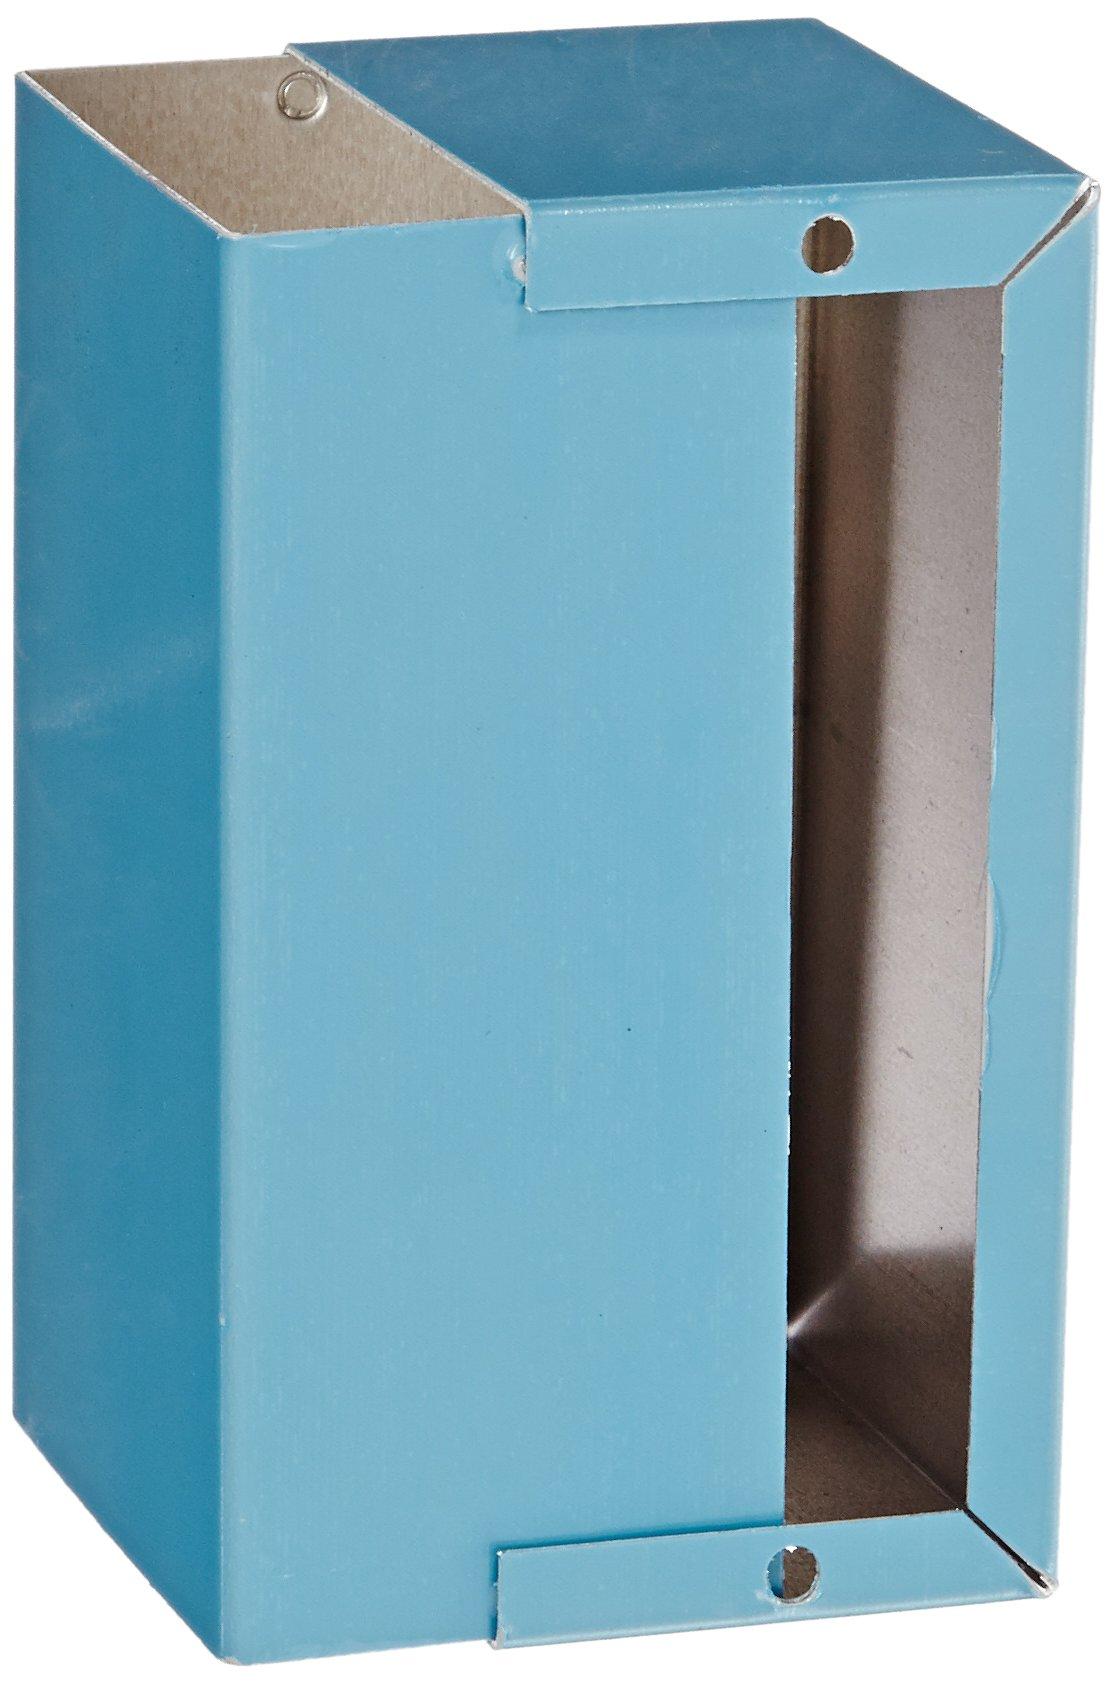 BUD Industries CU-2106-B Aluminum Electronics Minibox, 5-1/4'' Length x 3'' Width x 2-7/64'' Height, Smooth Gray Finish